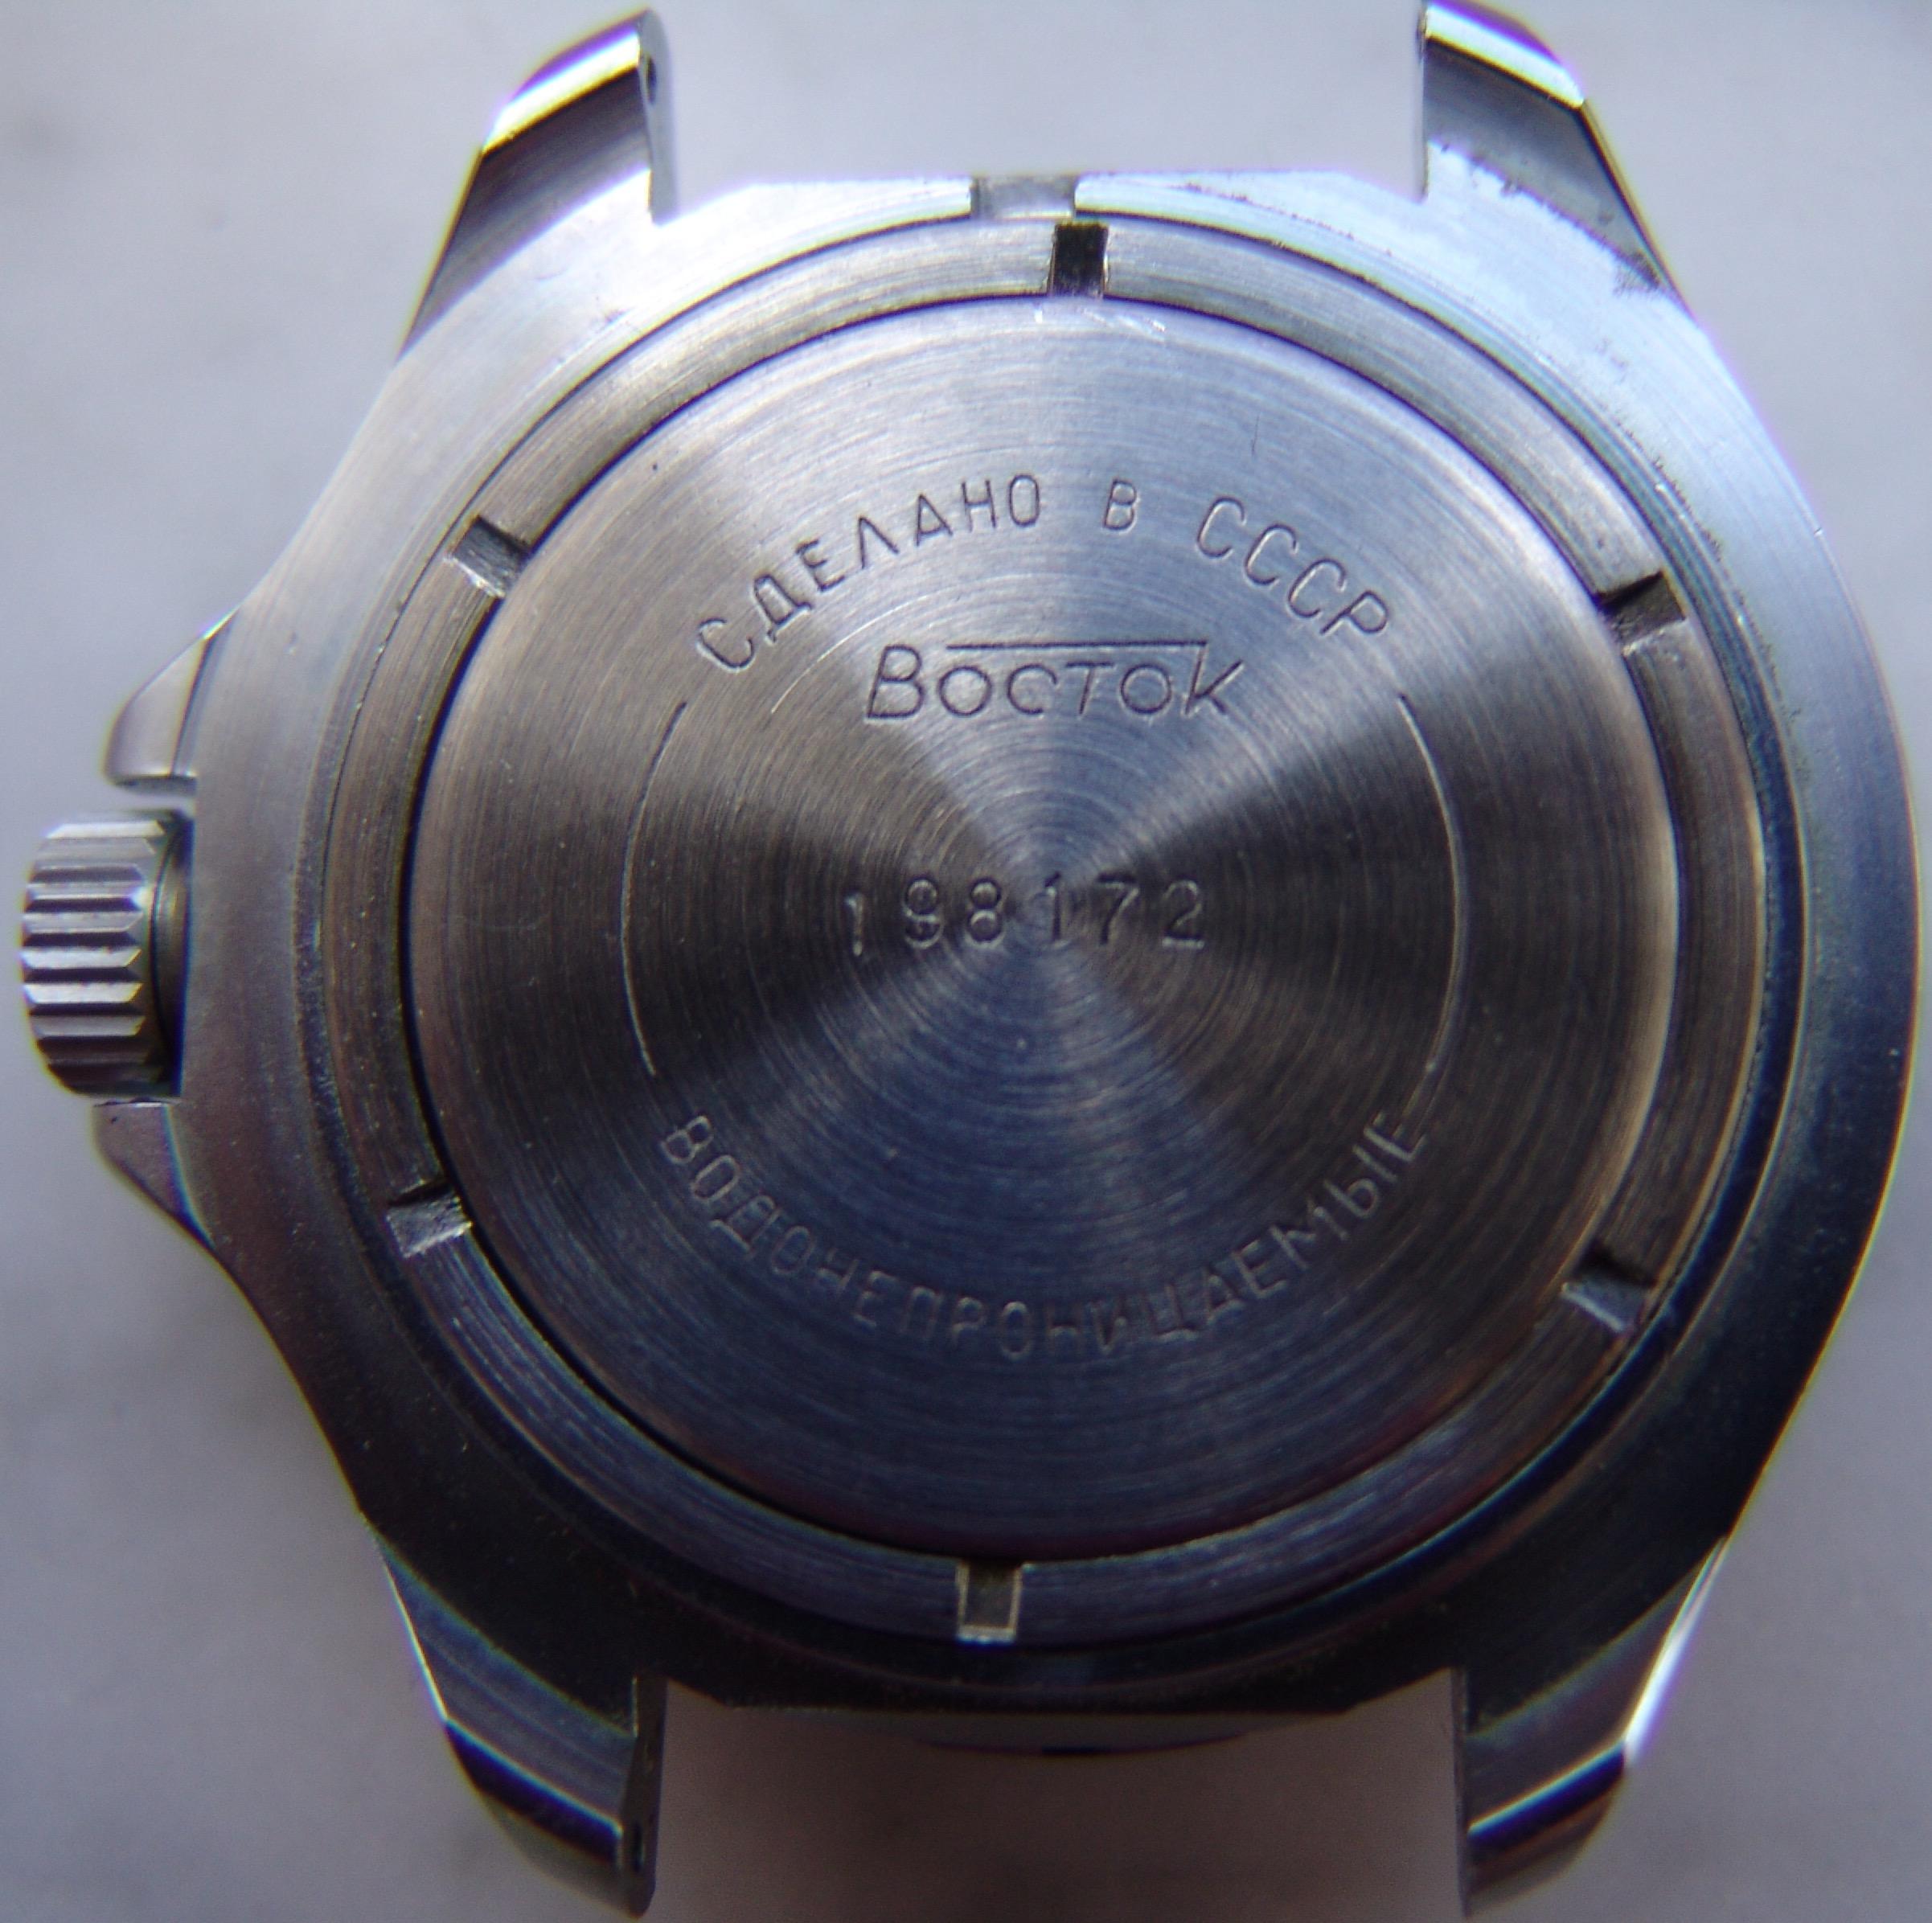 Vostok paternelle 150529071058470309